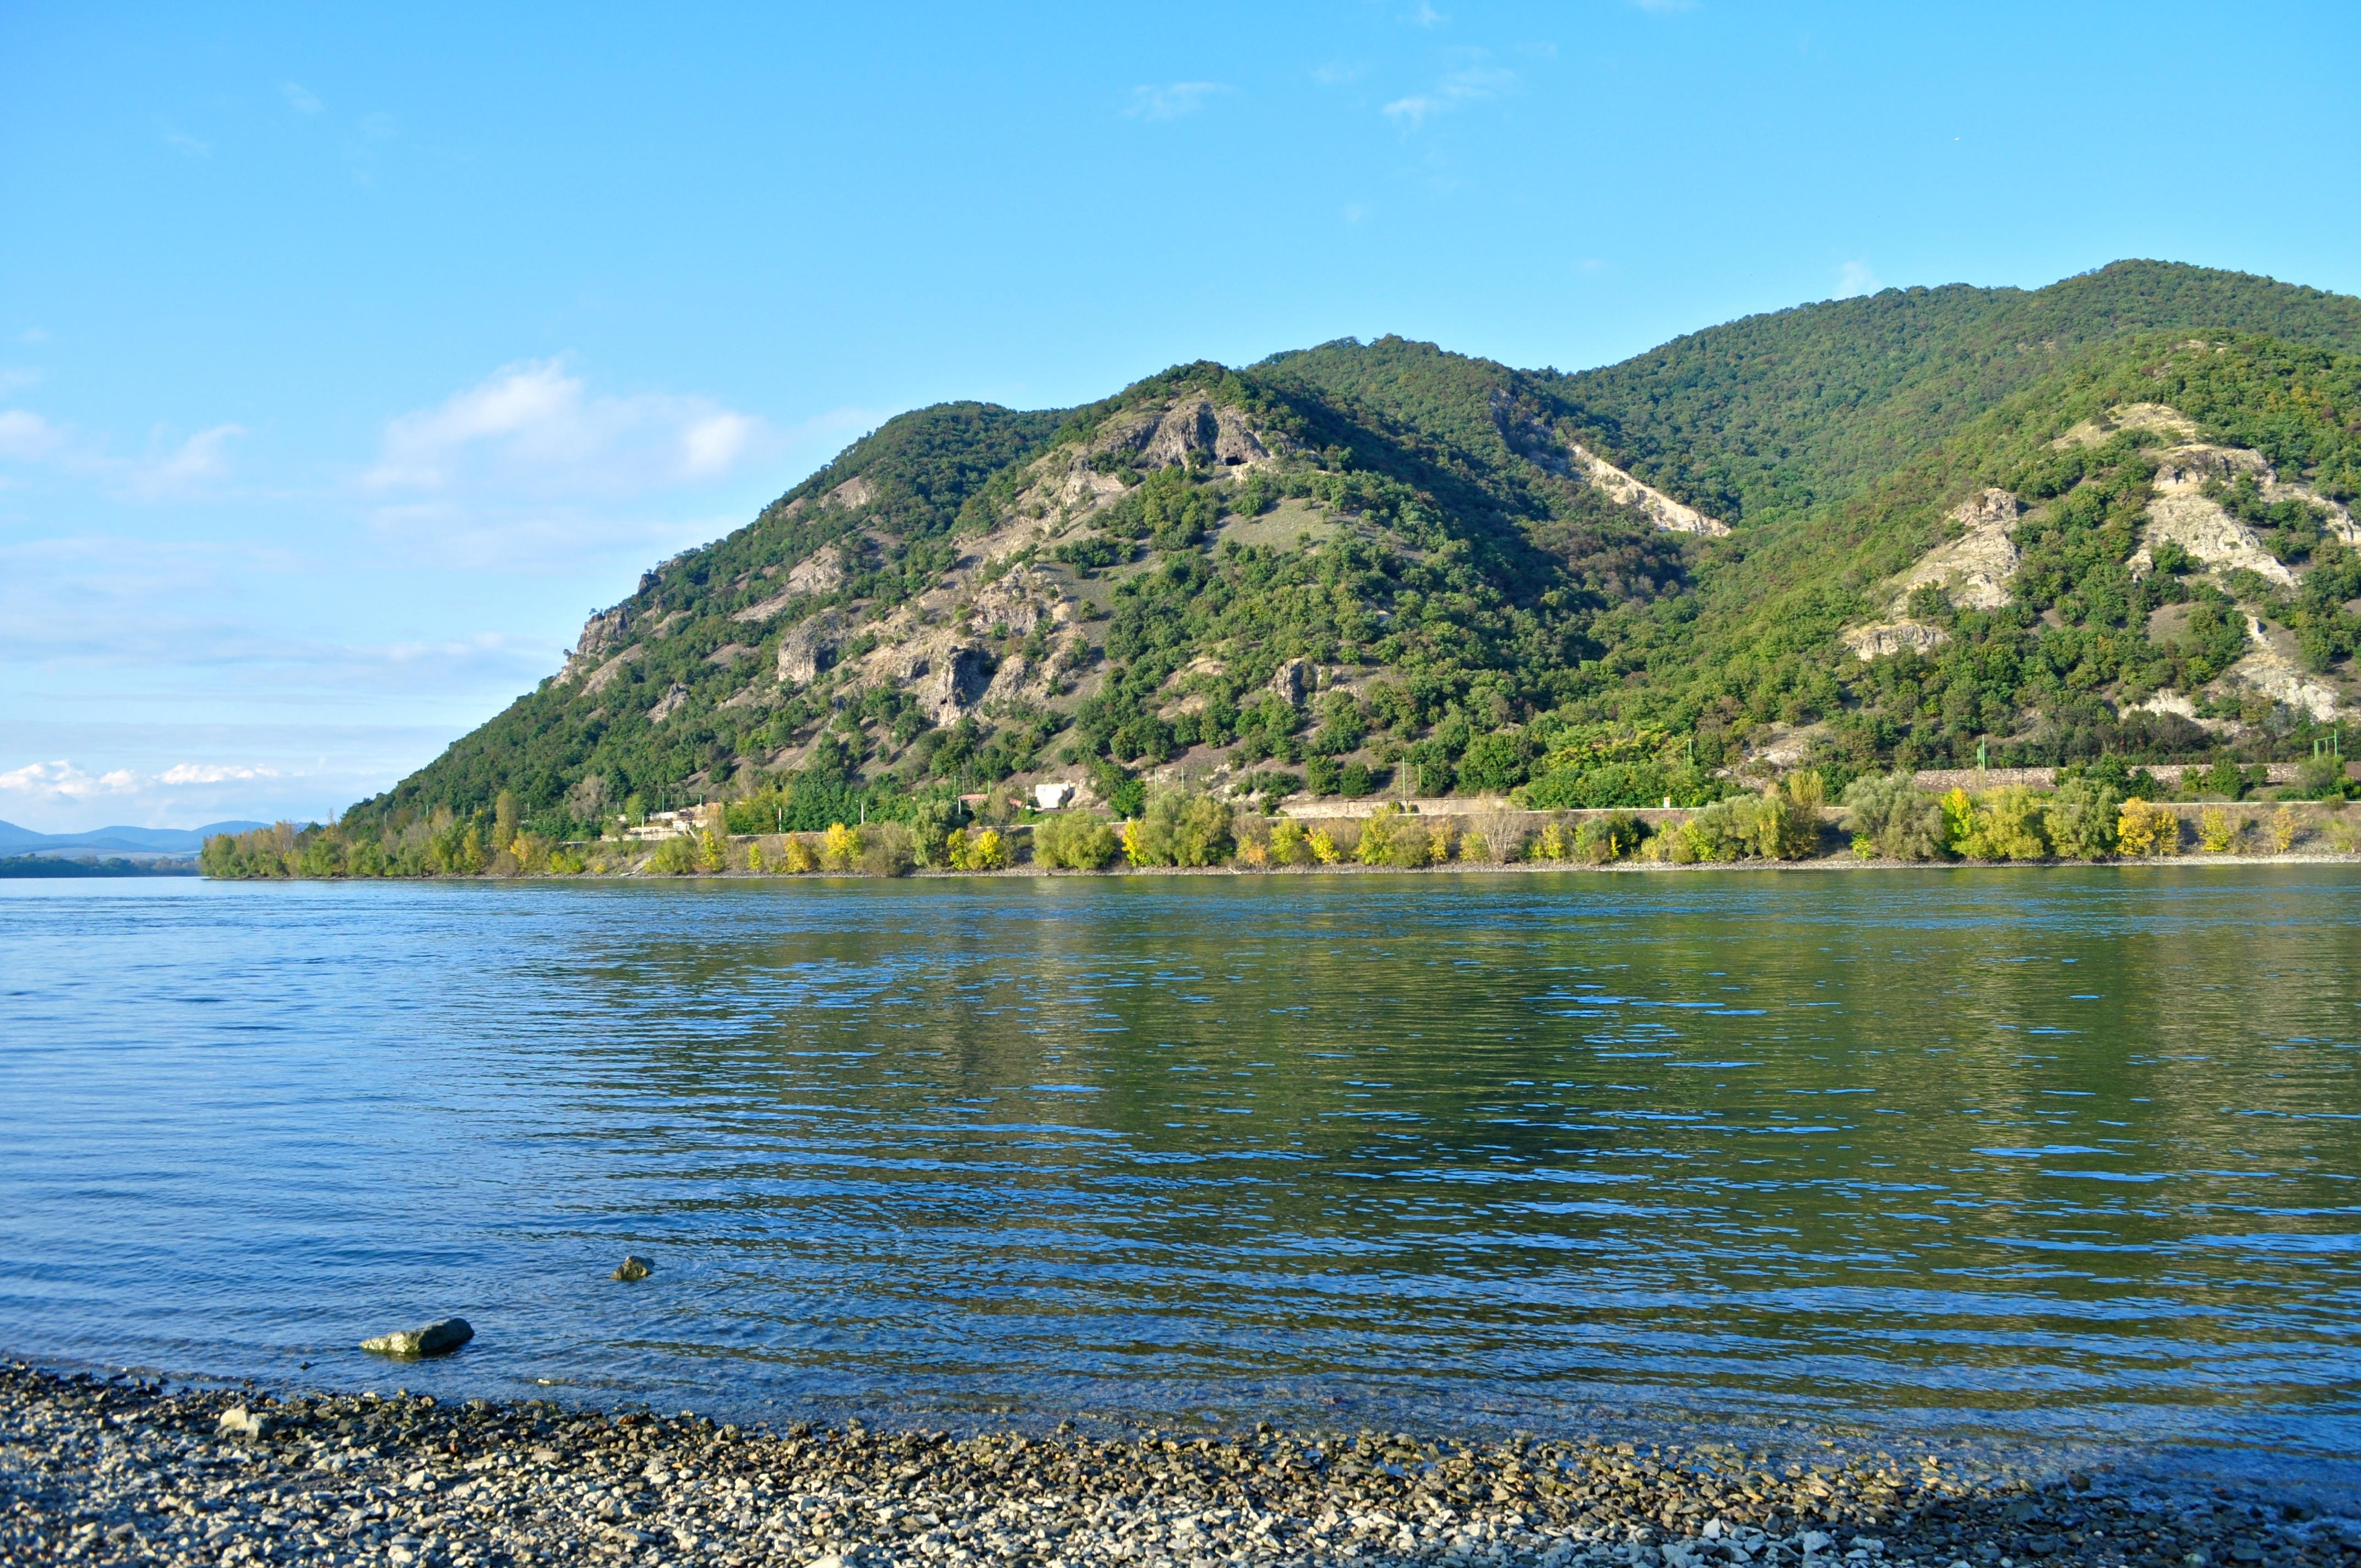 La courbe du Danube, Hongrie